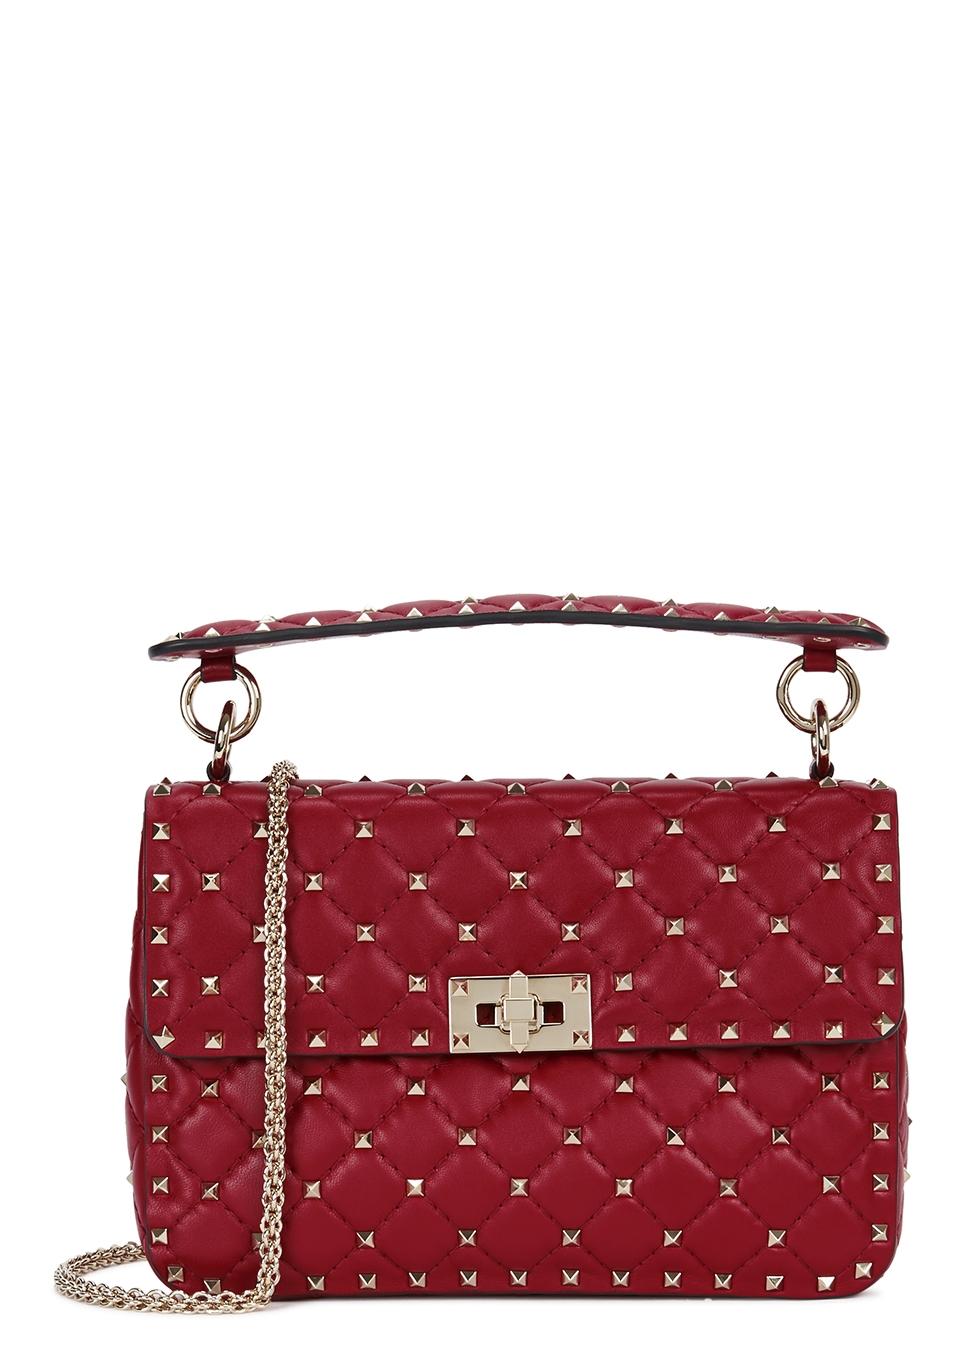 Valentino Garavani Rockstud Spike medium leather shoulder bag - Harvey  Nichols 8b4a61f056f2b